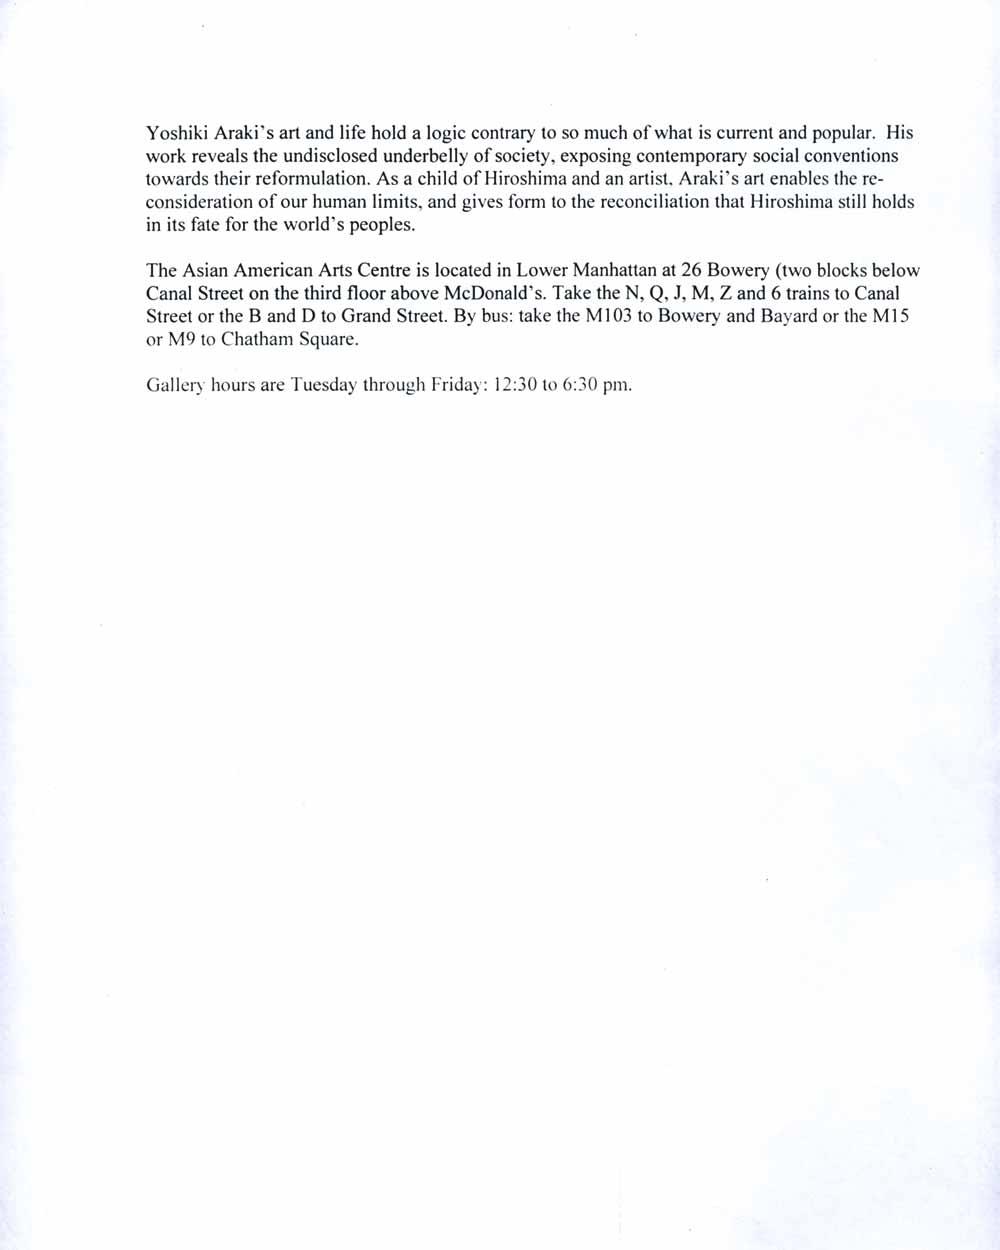 Hiroshima Born press release, pg 2